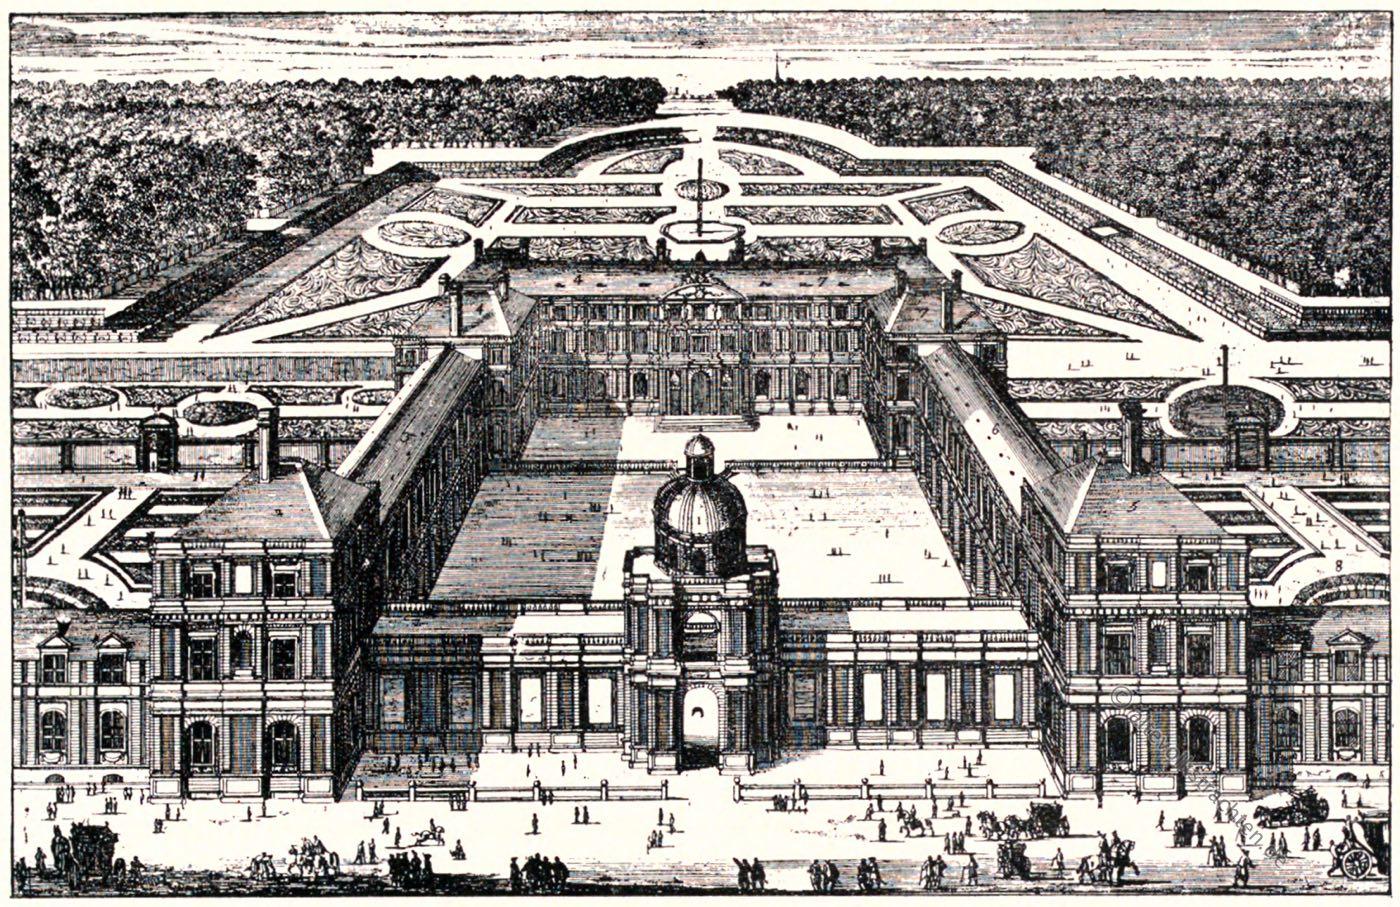 Paris, Palais Luxembourg, Perelle, Gartenanlage